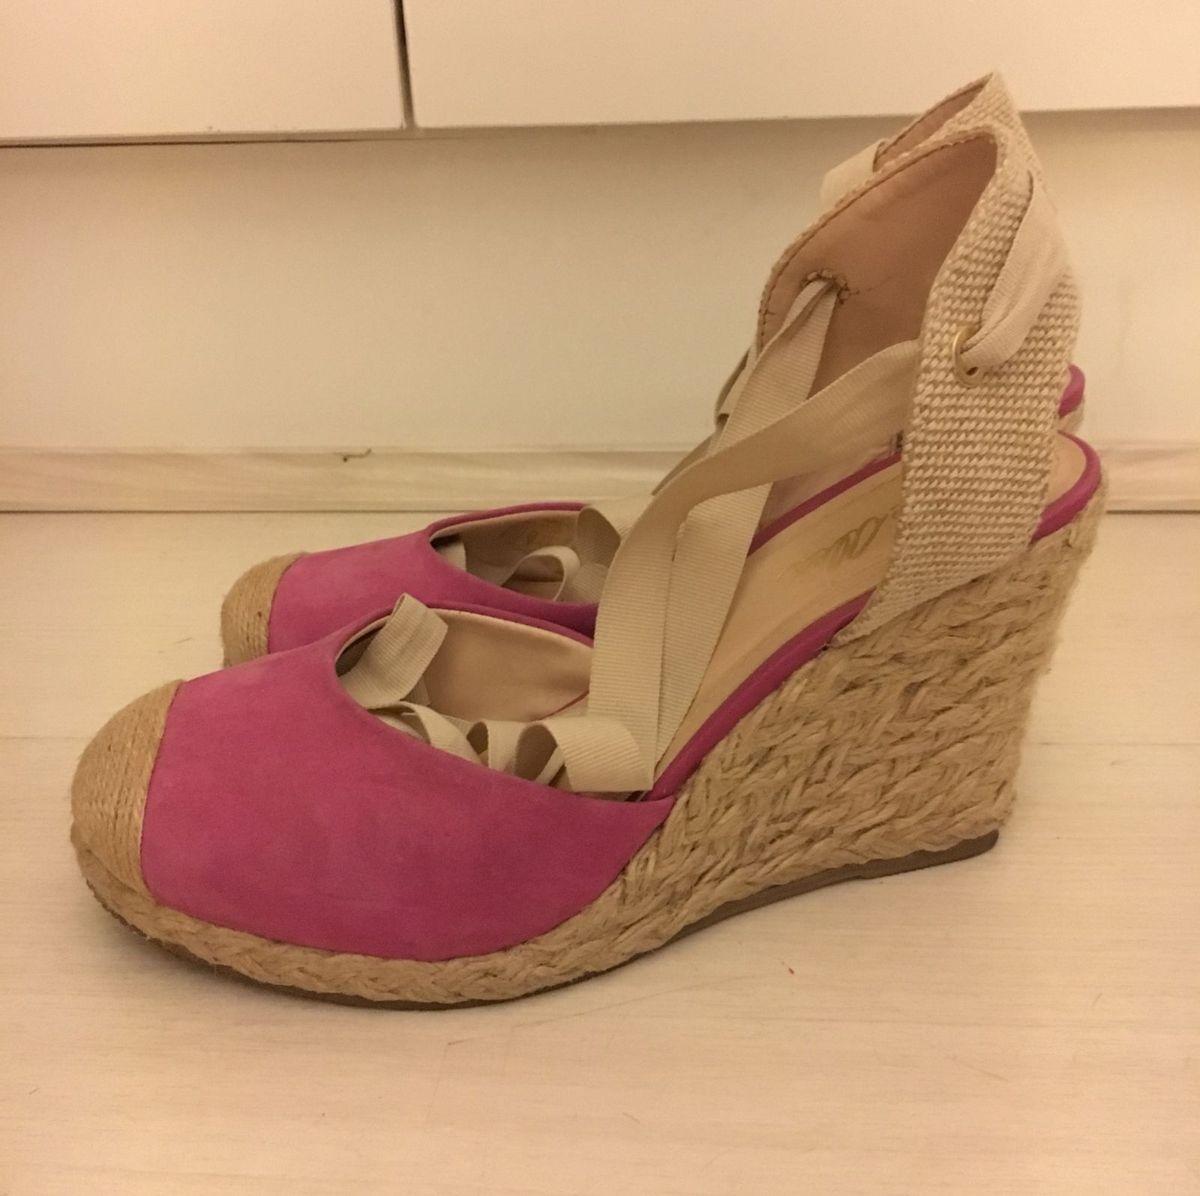 espadrille de chamois pink e corda - sandálias jorge-alex